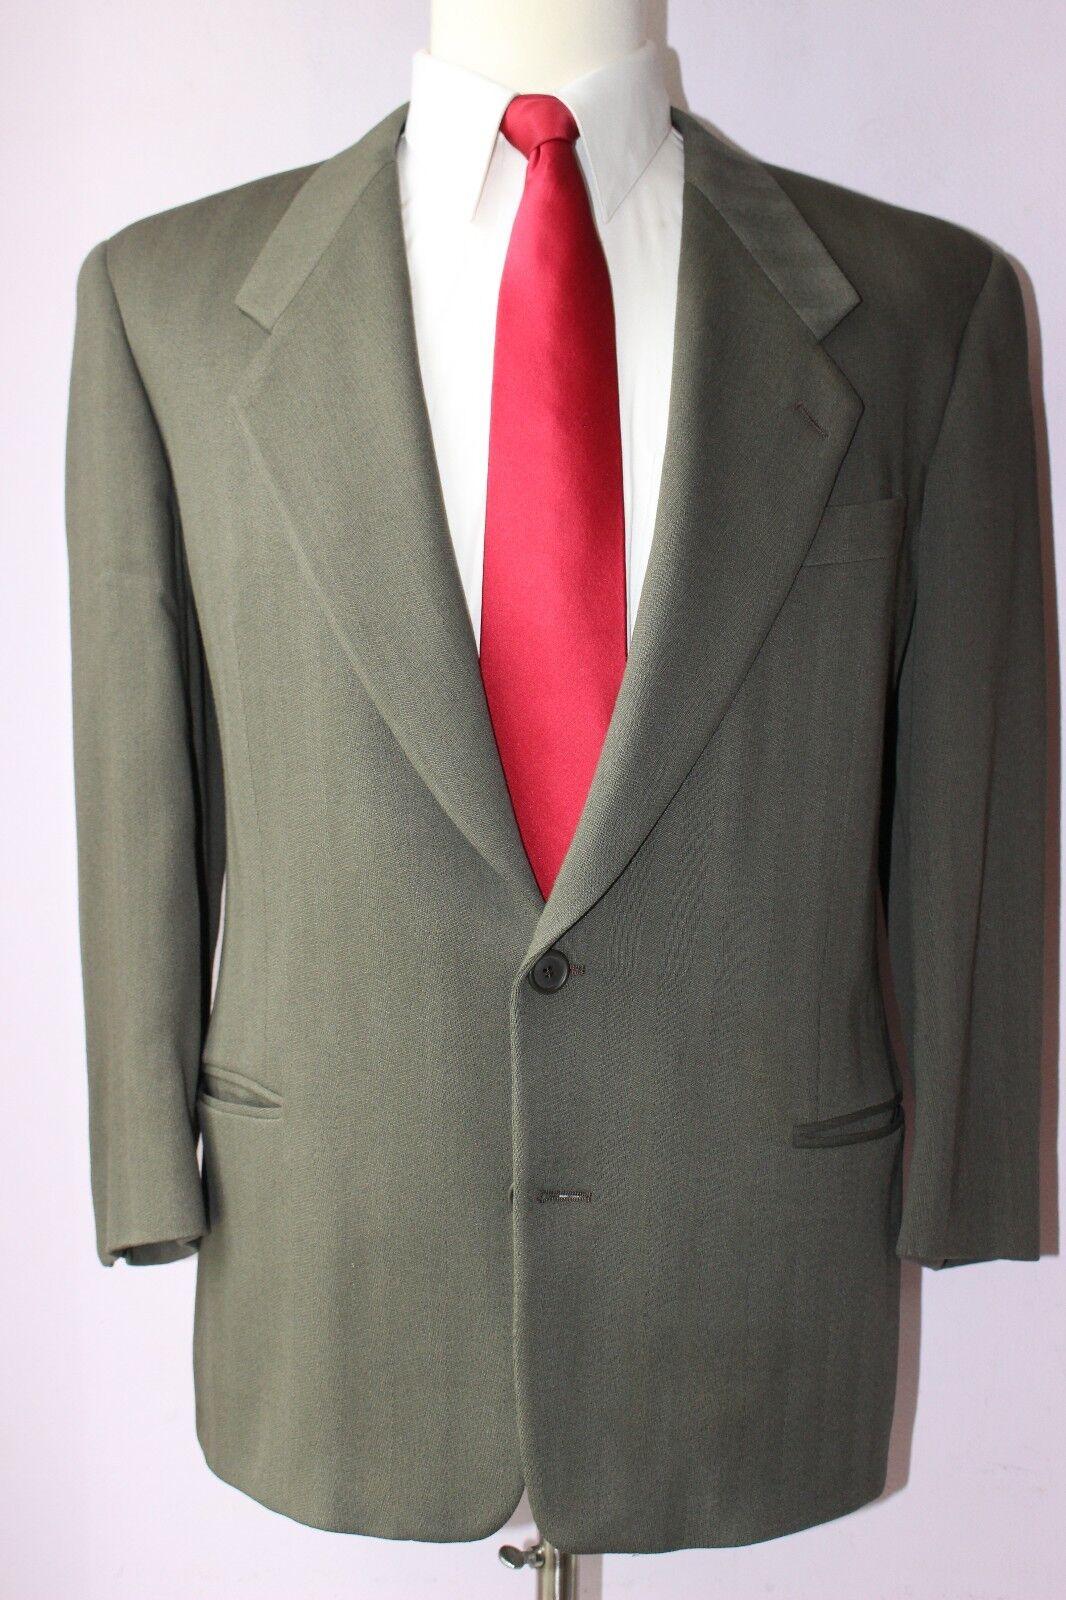 Giorgio Armani Collezioni Taupe Herringbone Two Button Wool Suit 42 S 32 26 Pant